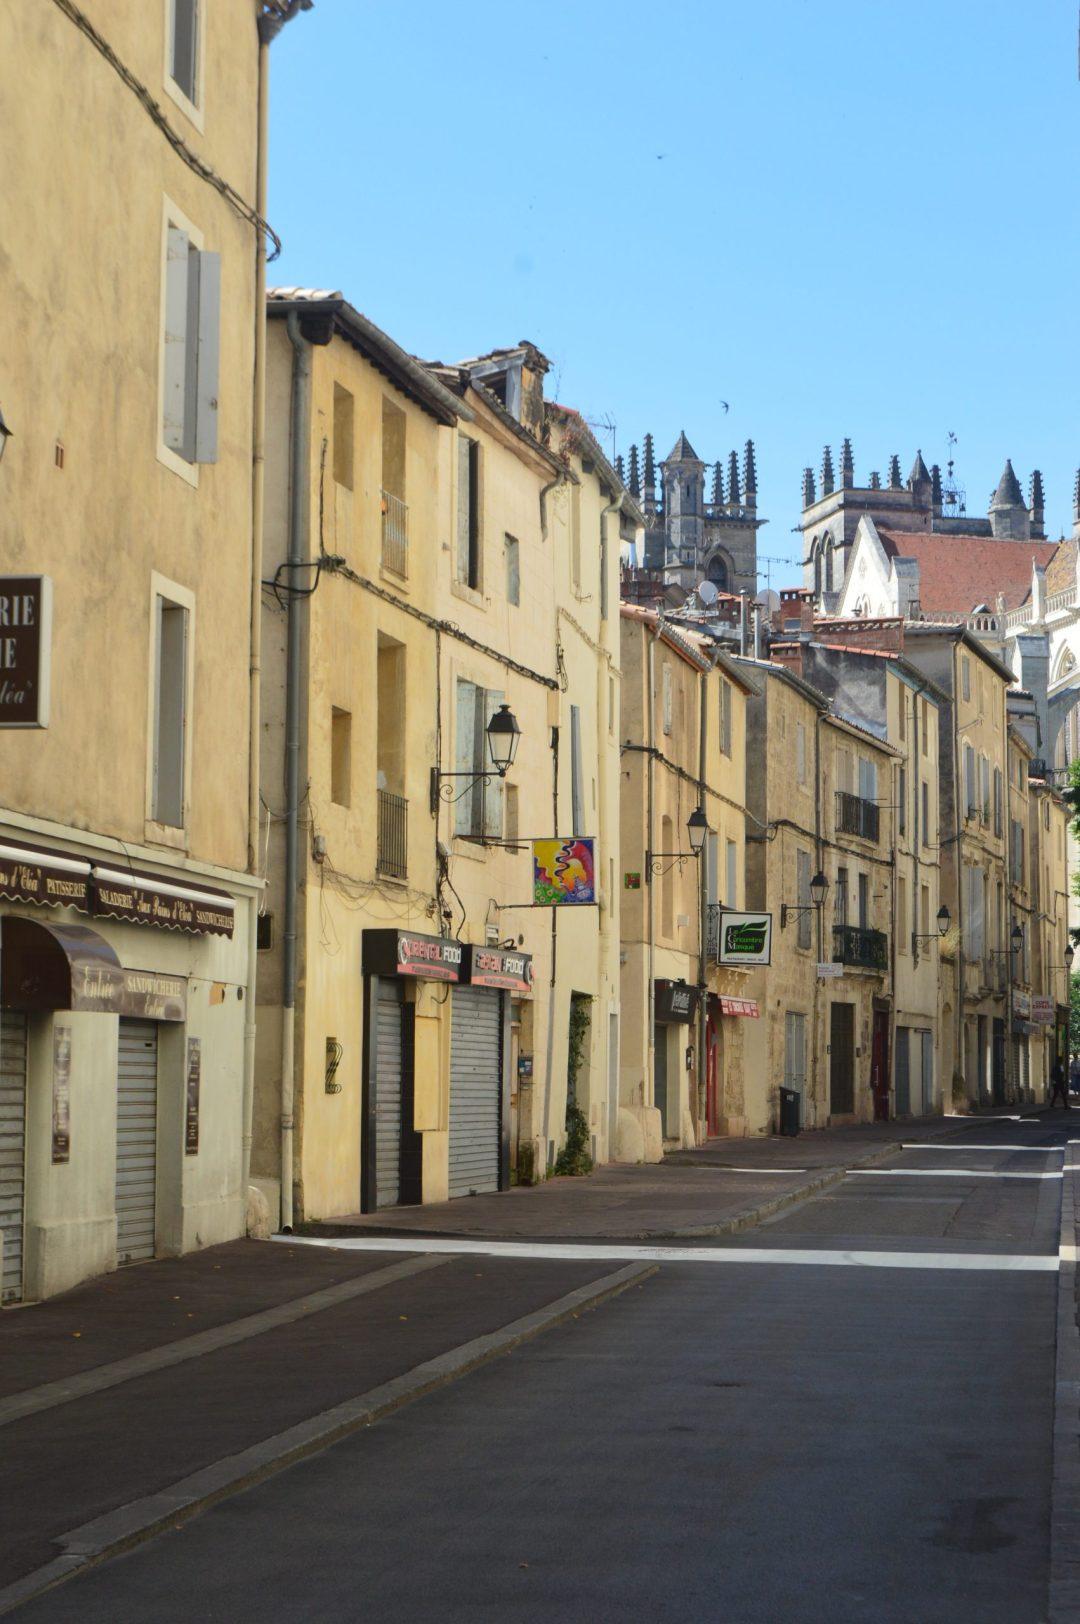 Les rues montpellier france